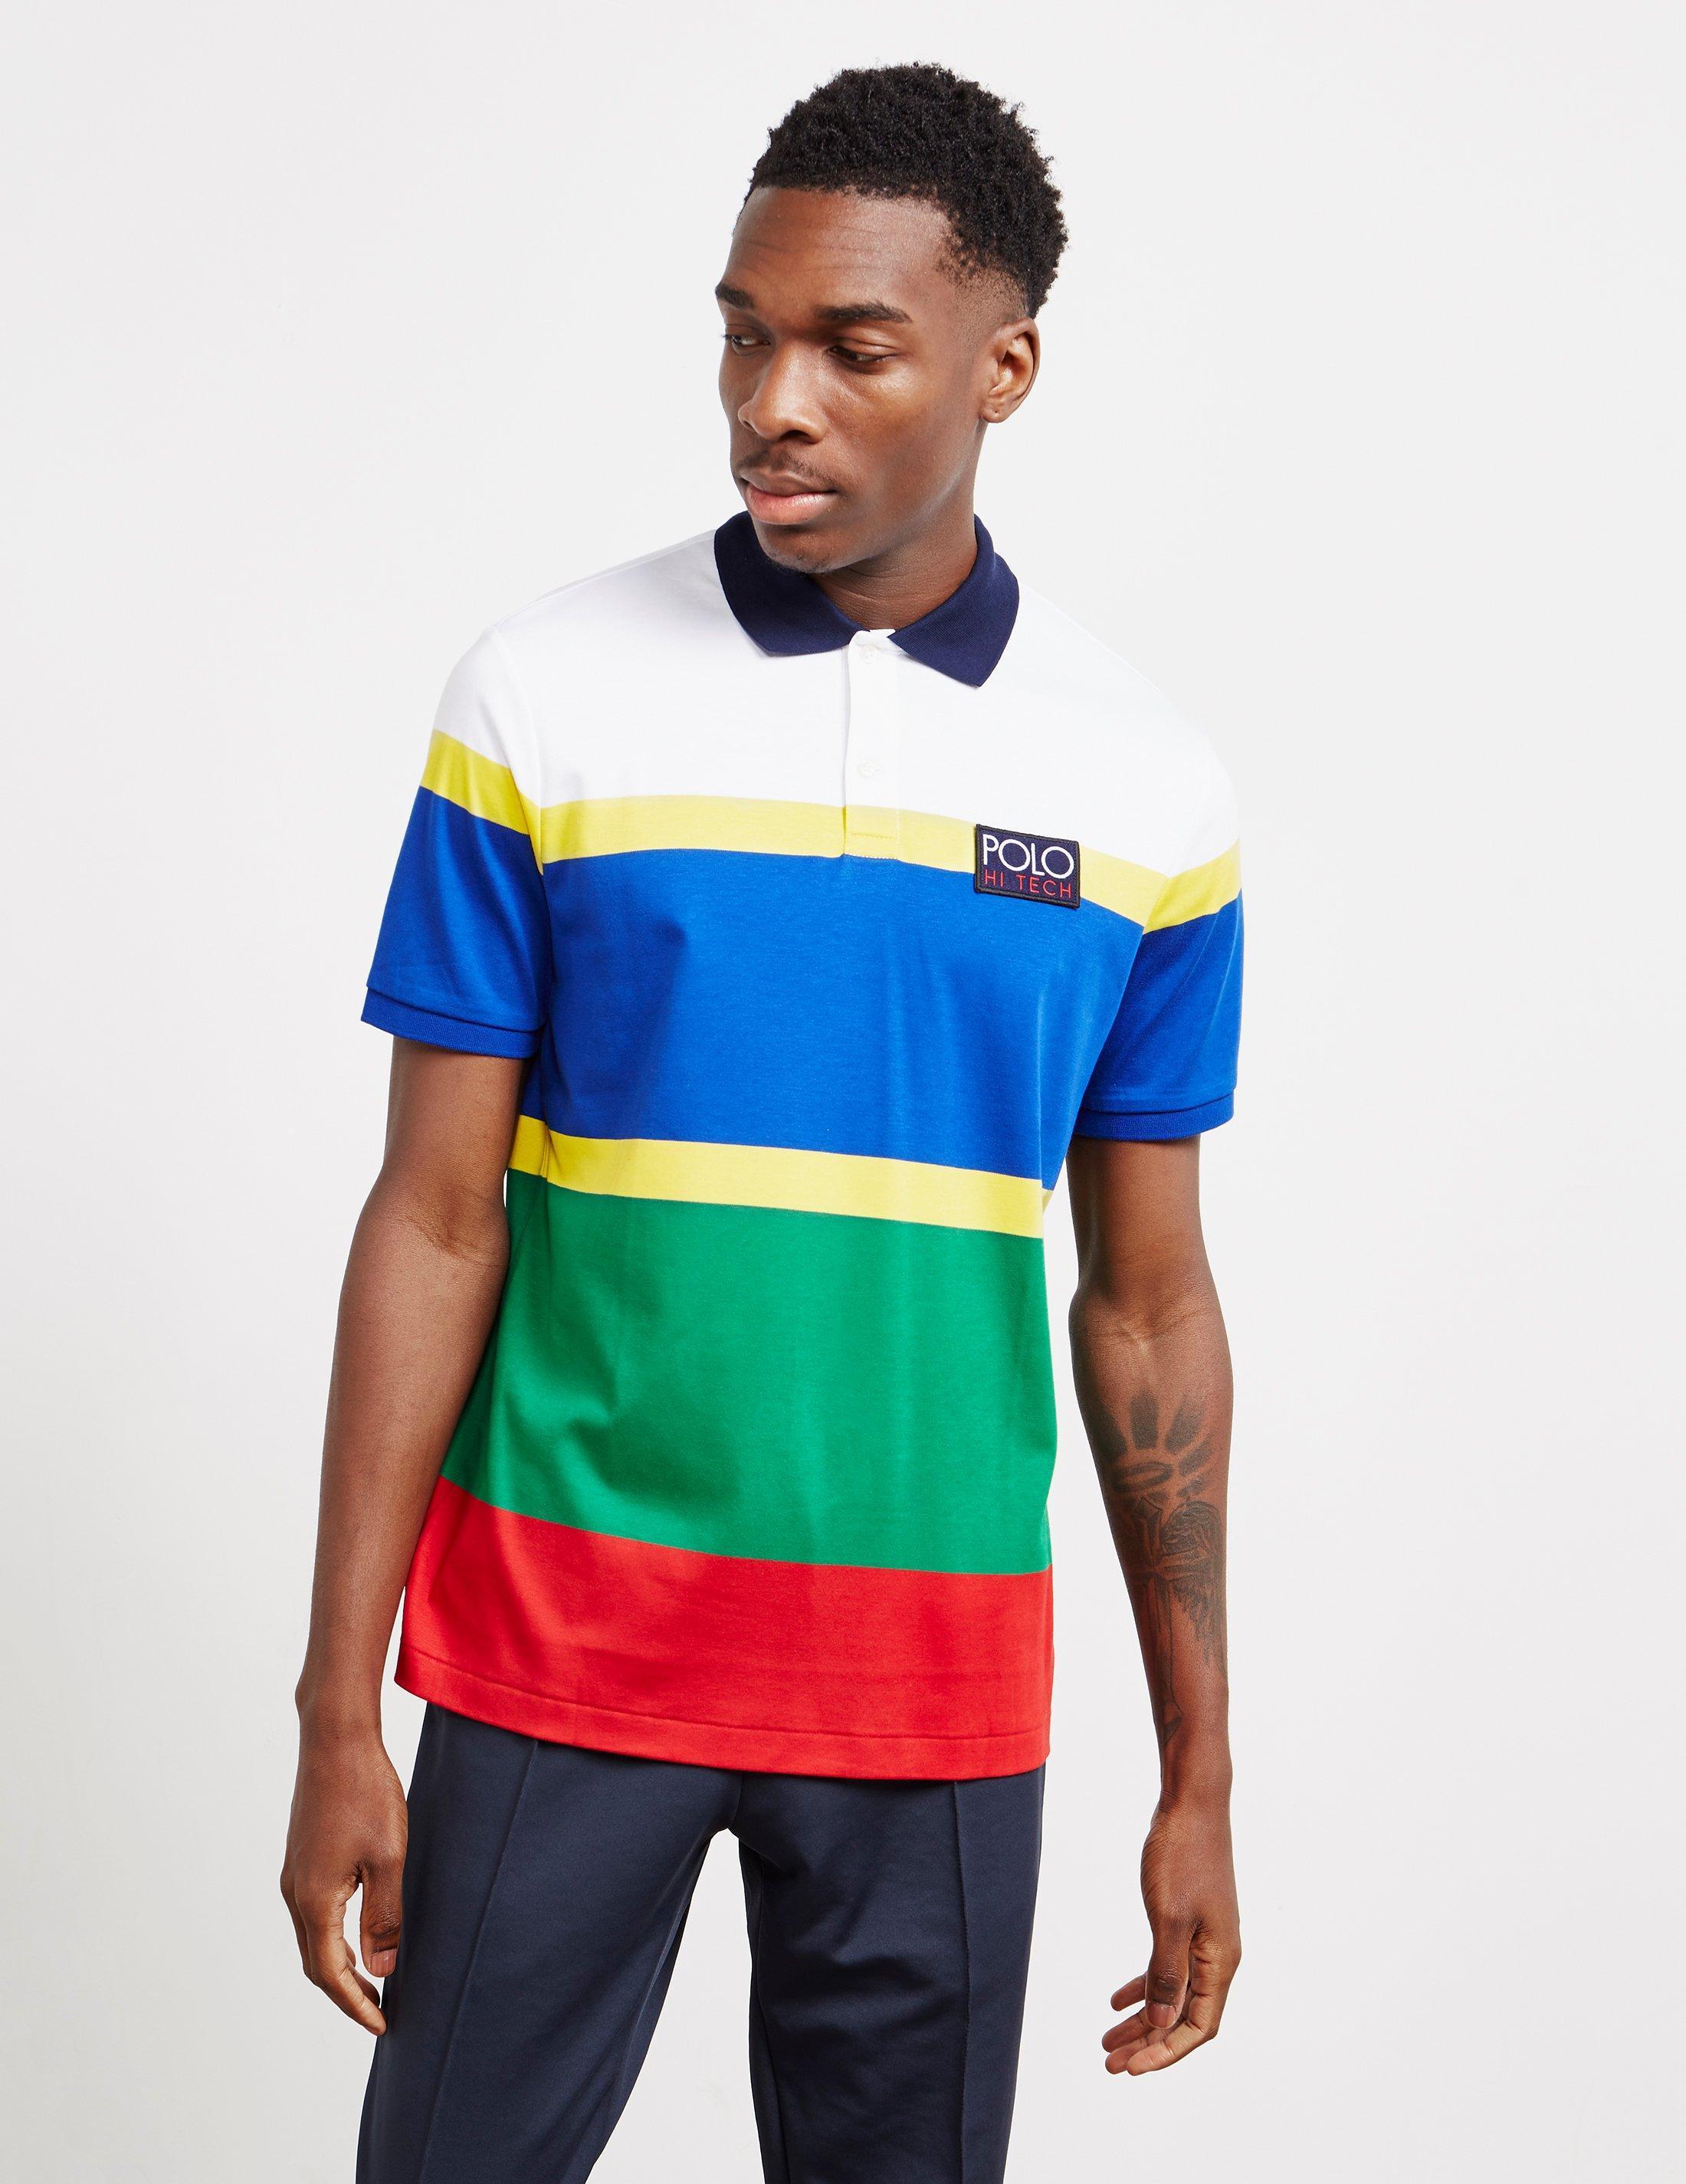 529cd7af73f89 Lyst - Polo Ralph Lauren Hi Tech Short Sleeve Polo Shirt White in ...